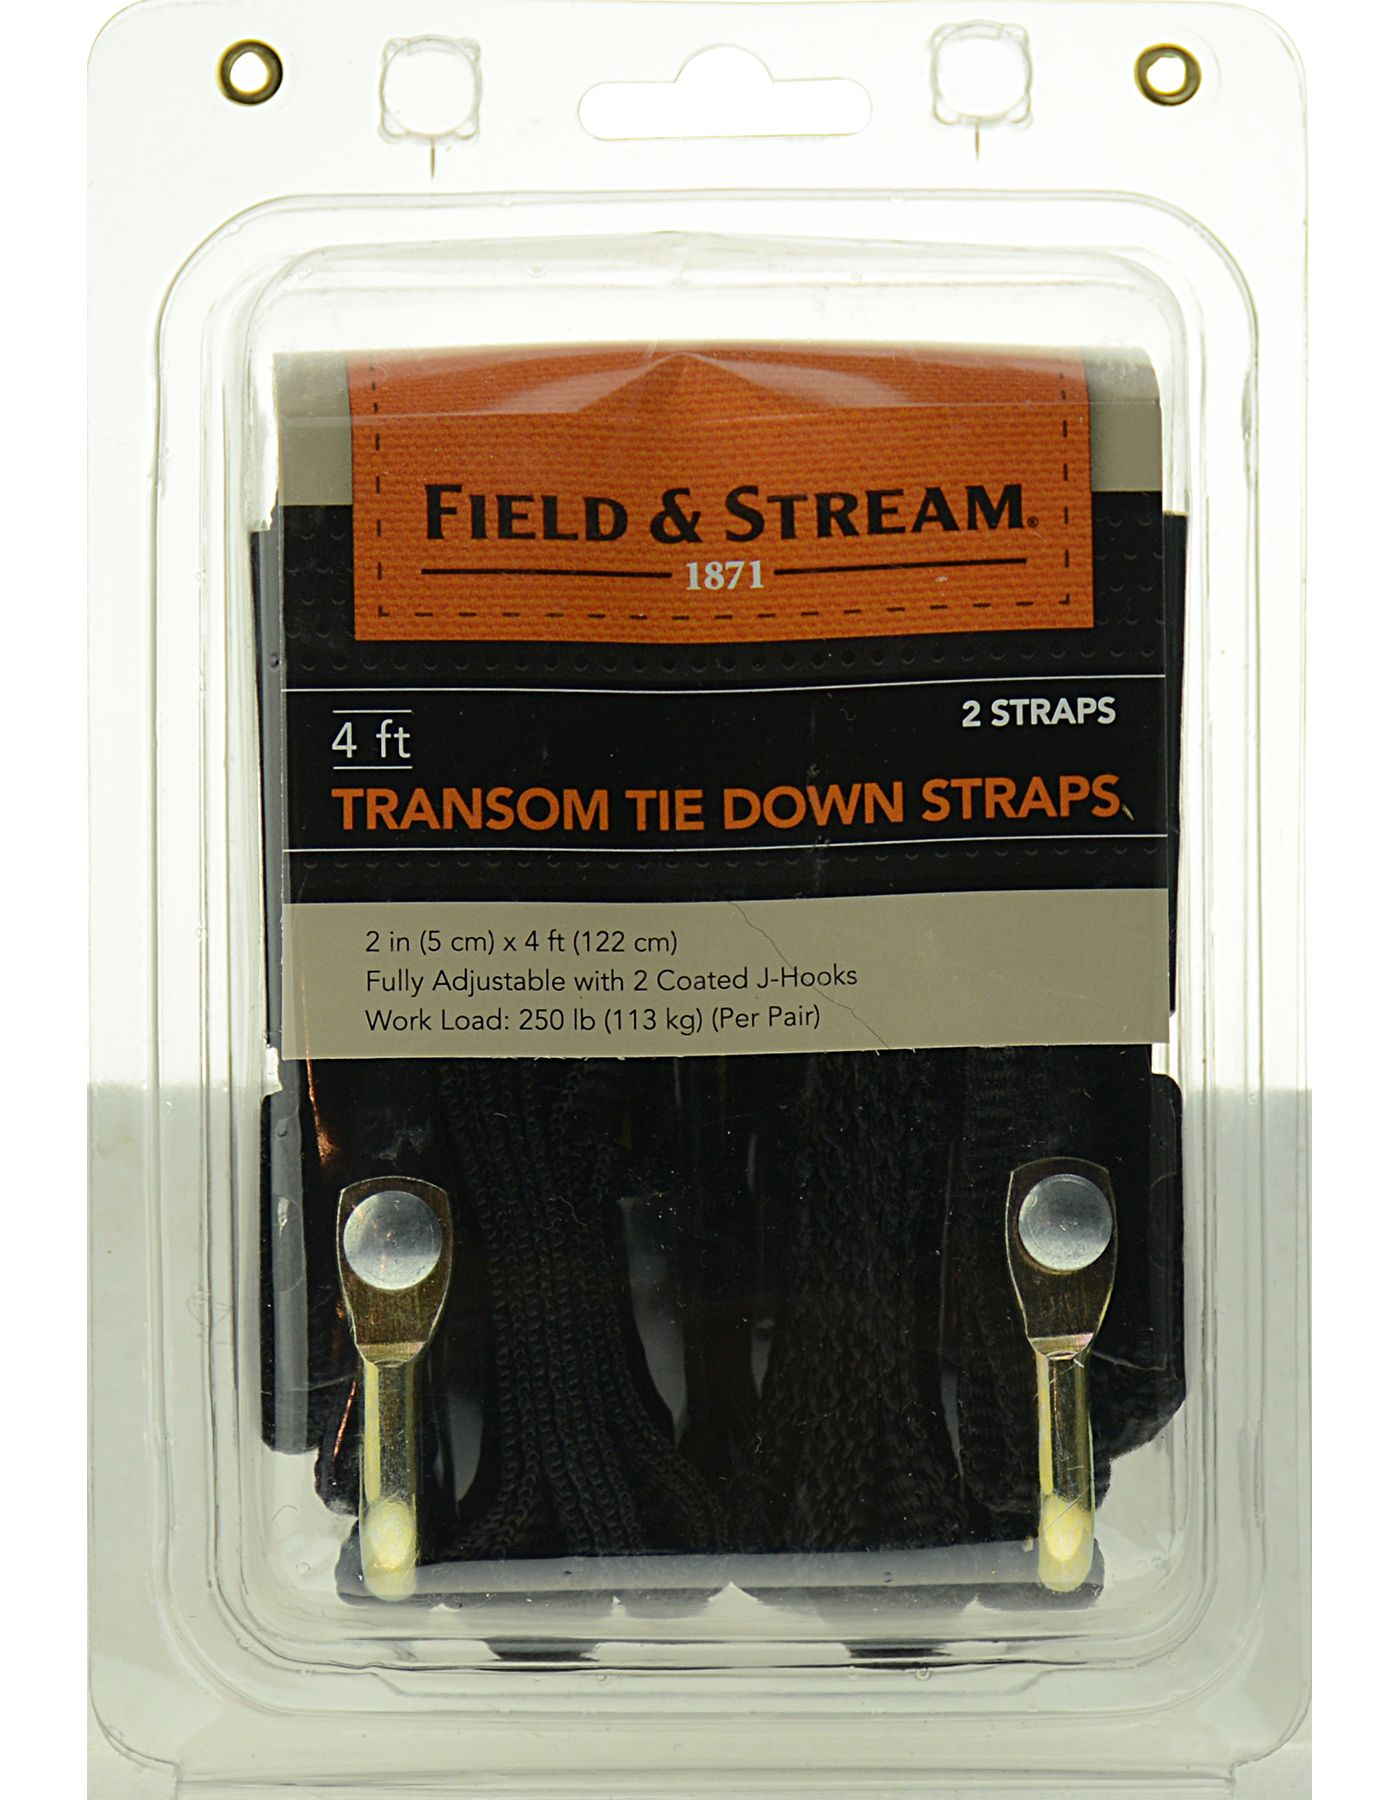 Field & Stream Transom Tie Down Straps